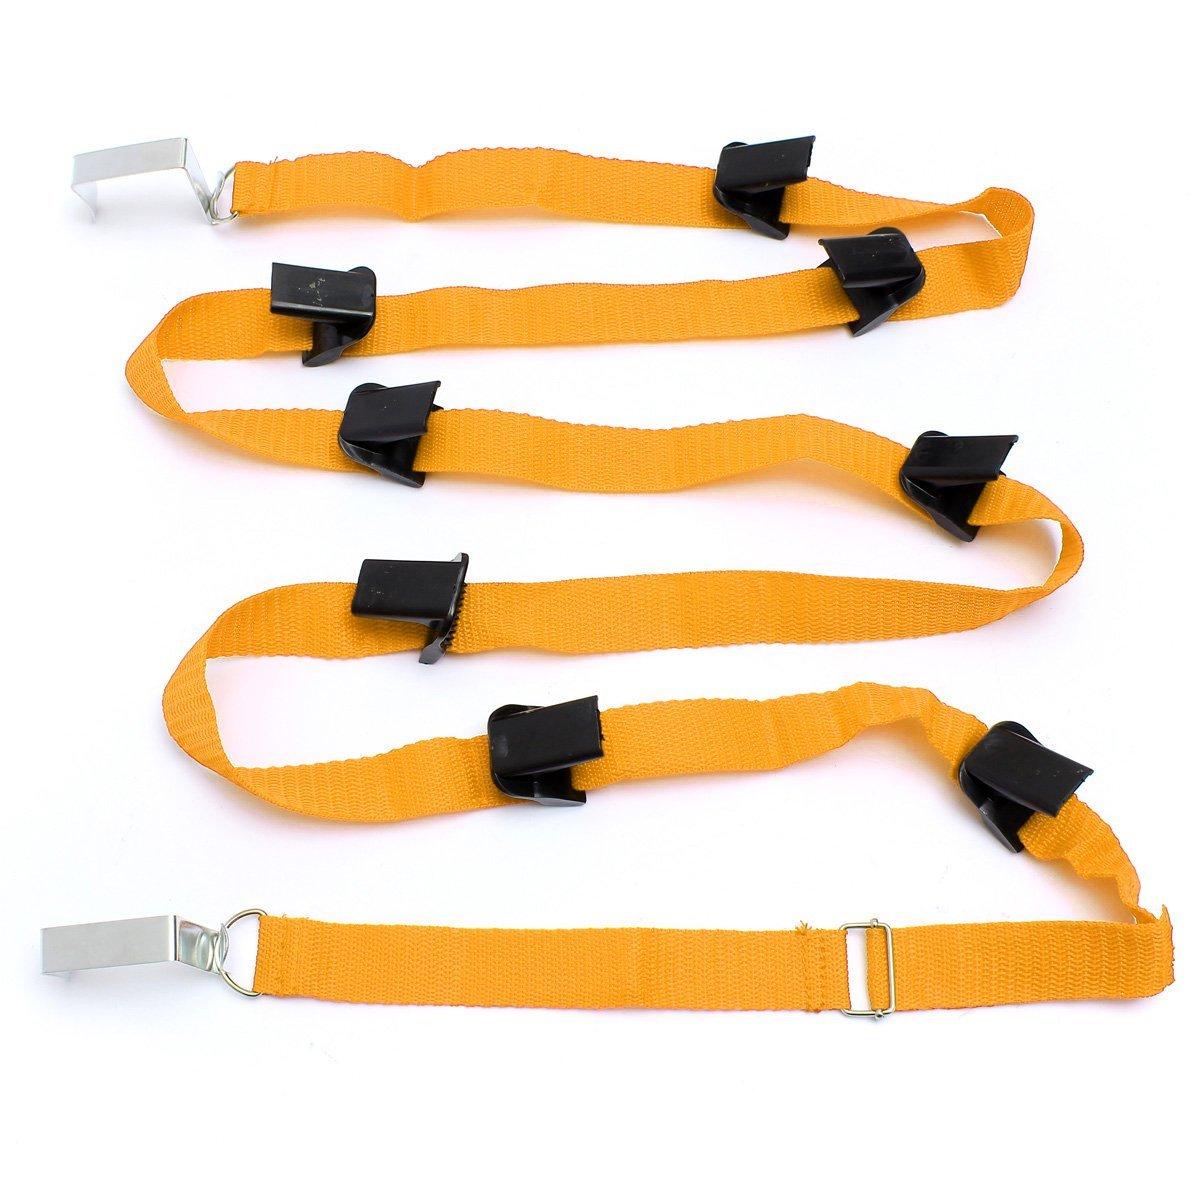 Hook Adjustable Buckle Strap Organizer Door Strap Lanyard Storage for Bags Hat Clothes, Orange